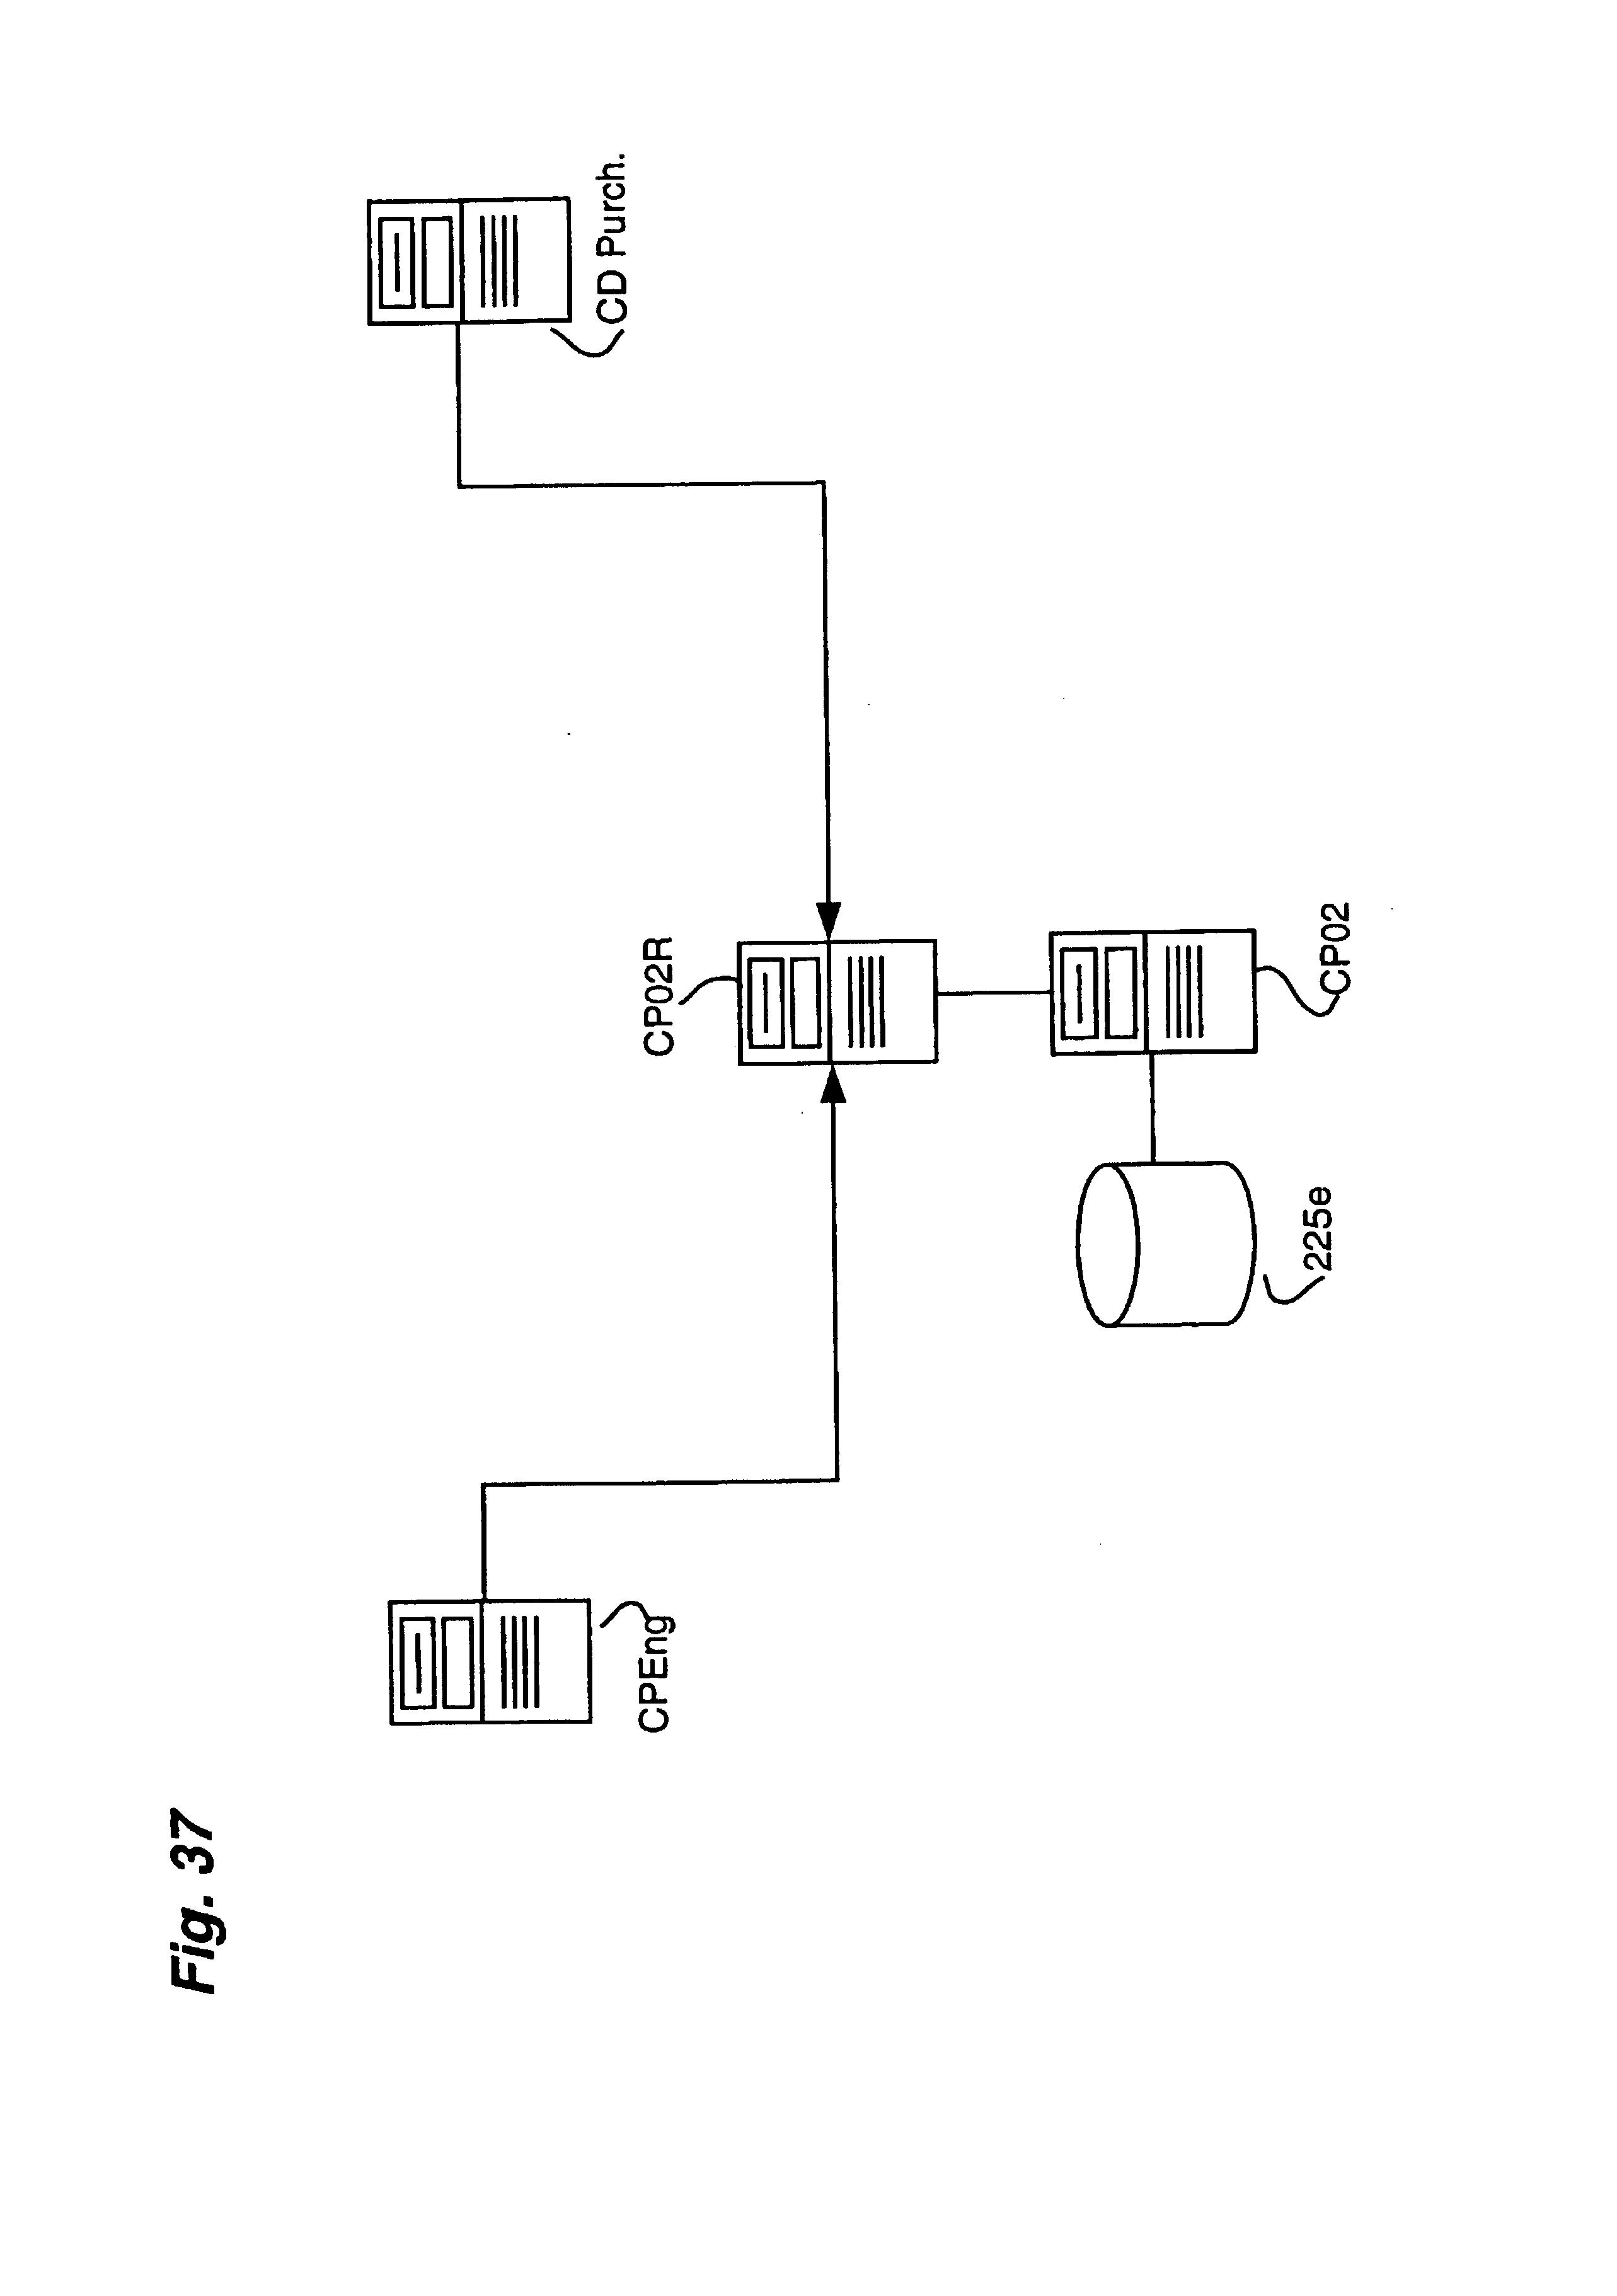 Patent US 7,149,724 B1